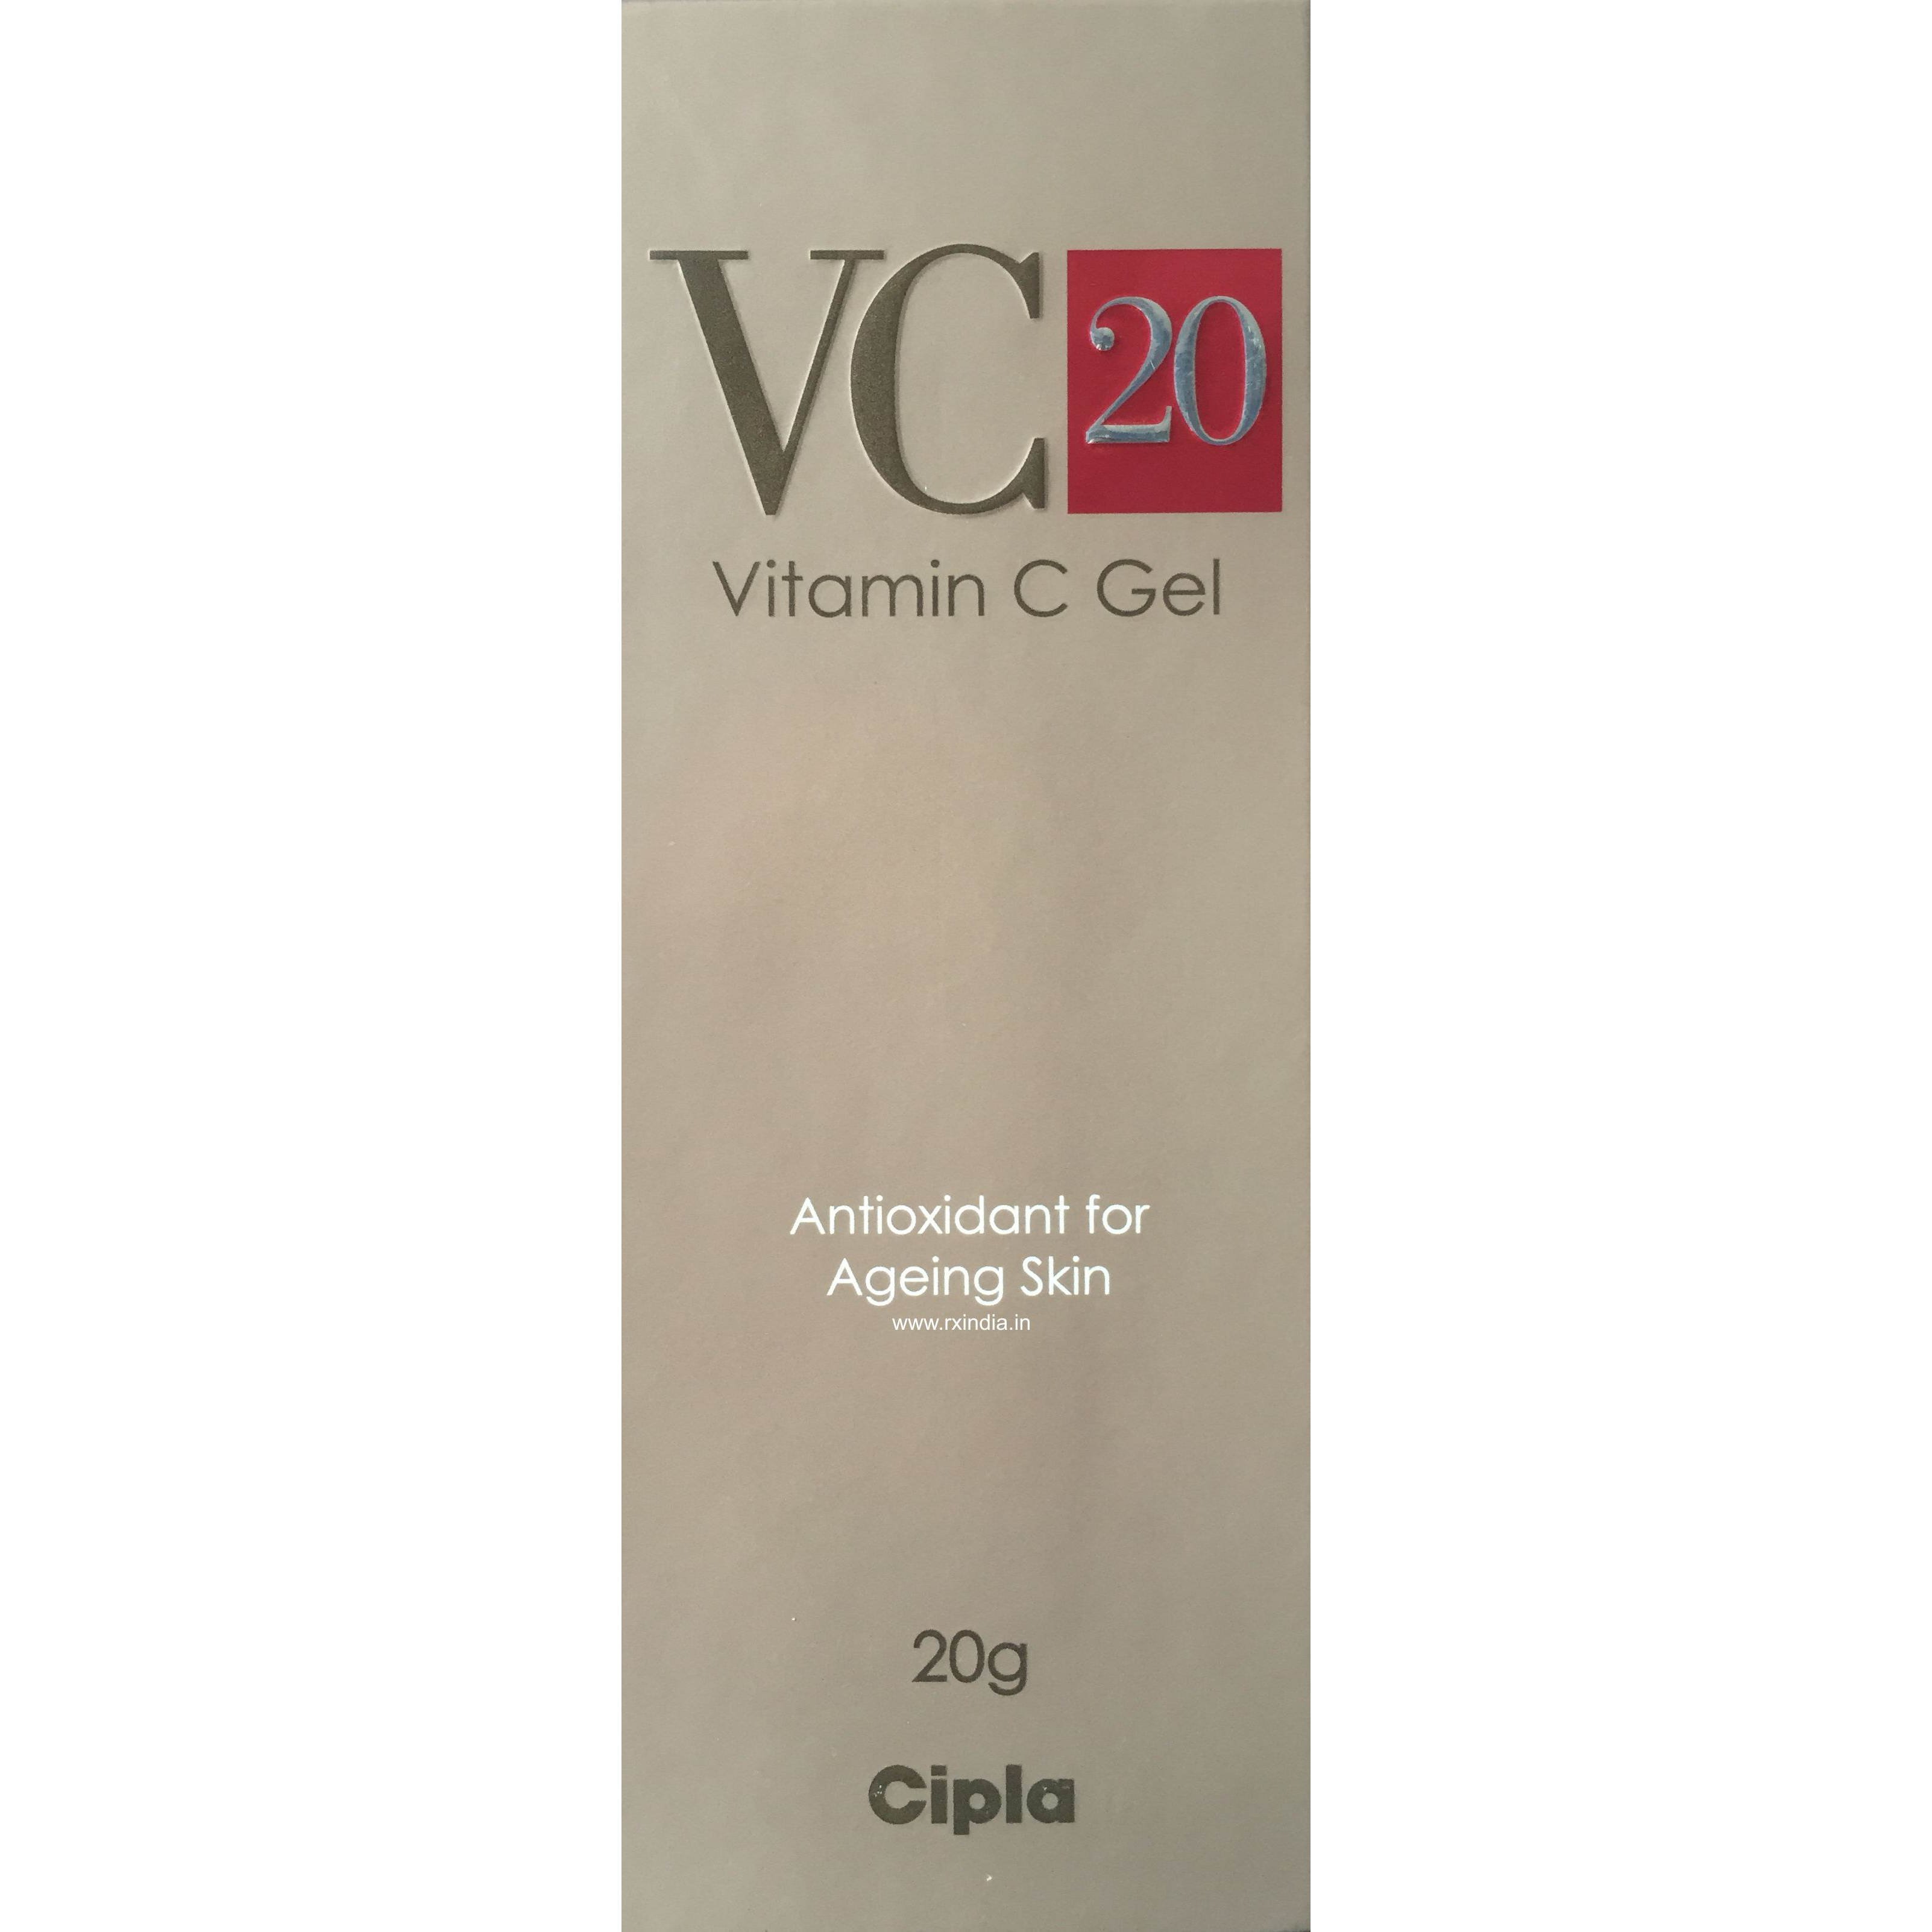 VC 20 Vitamin C Gel 20g